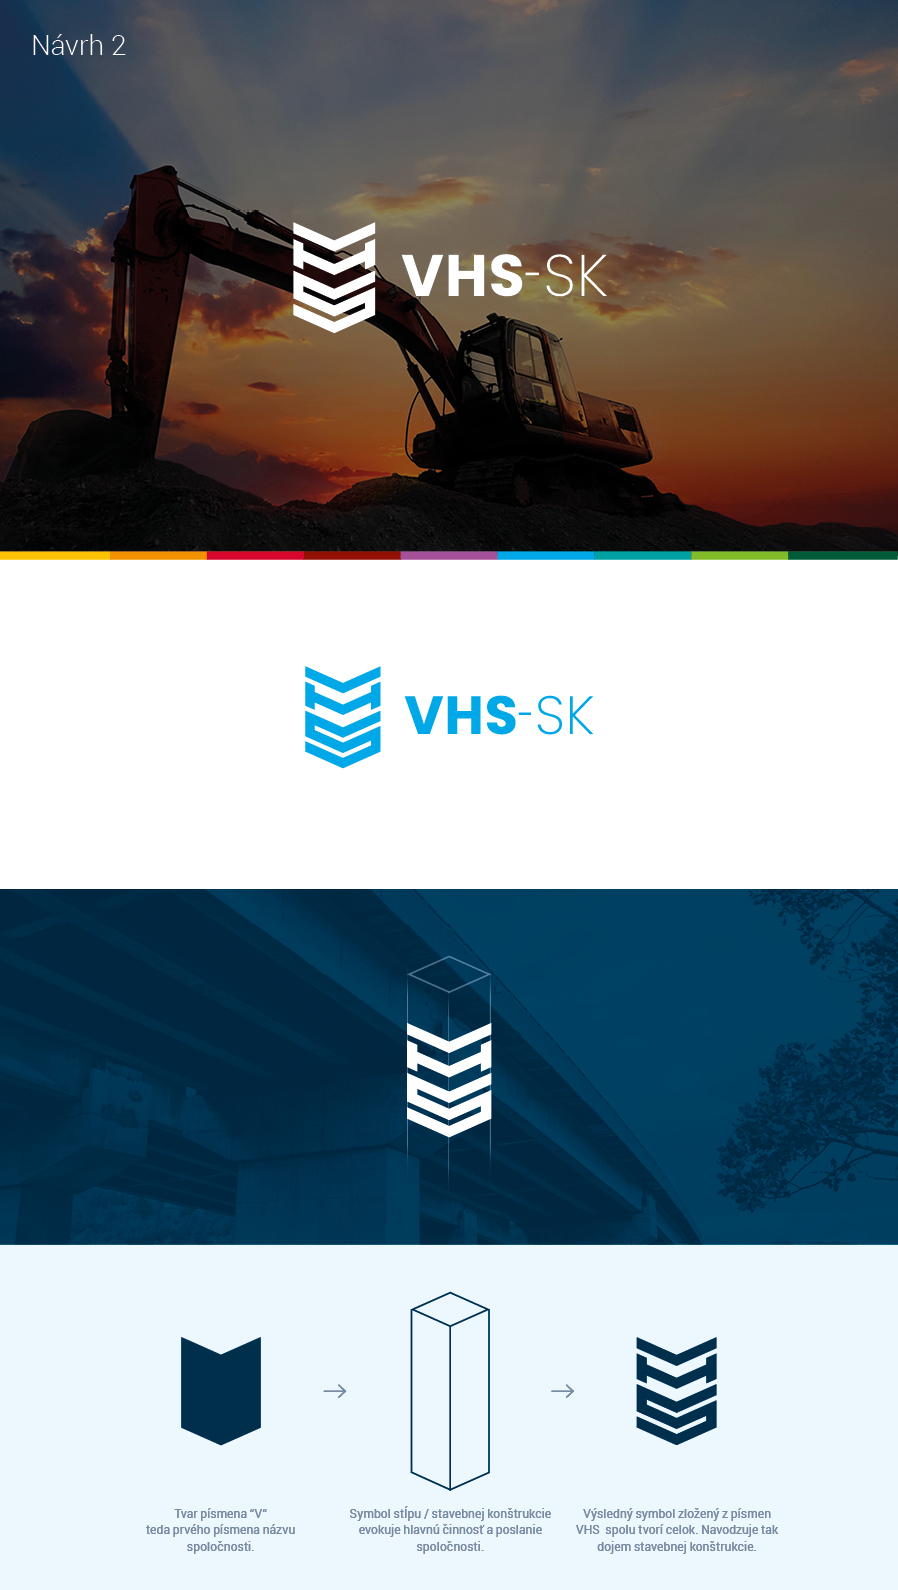 vhs-12